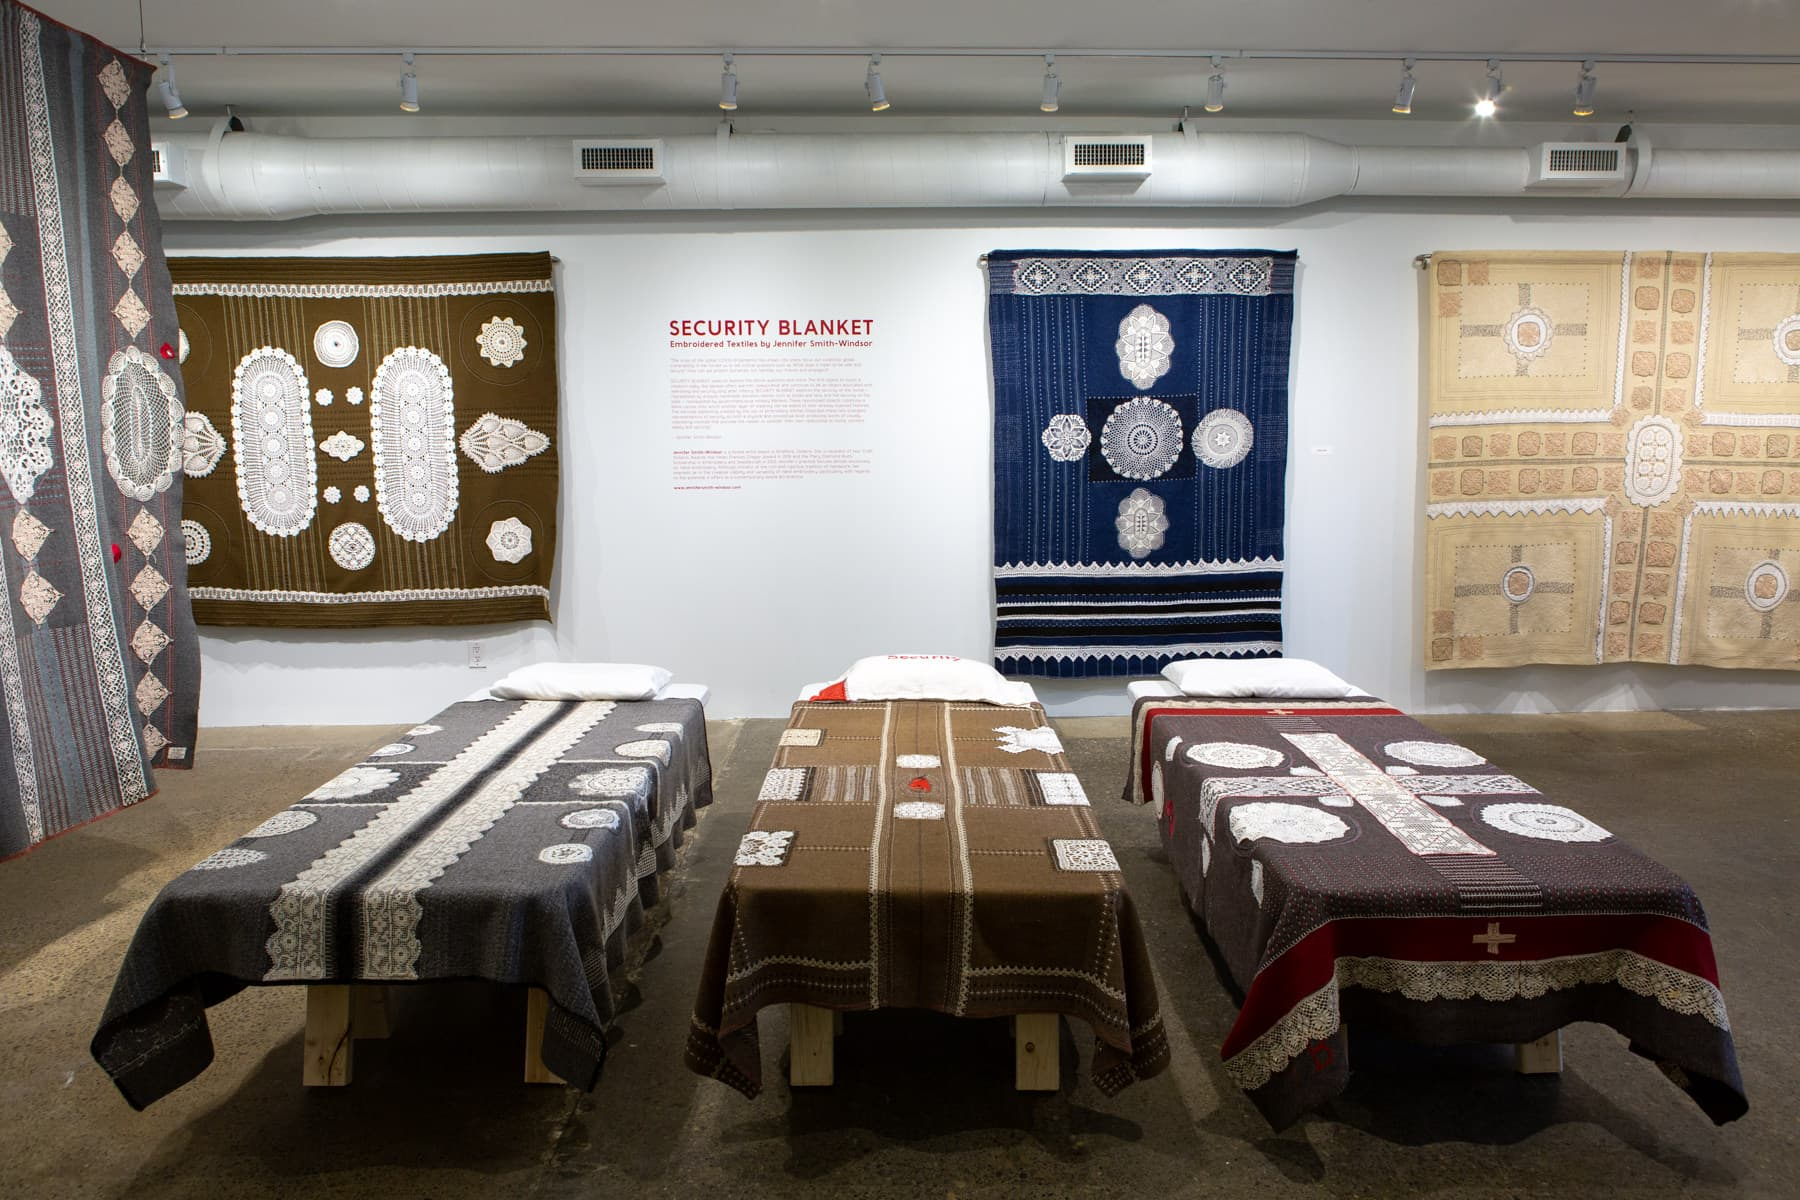 Virtual Video Tour: Security Blanket at Craft Ontario